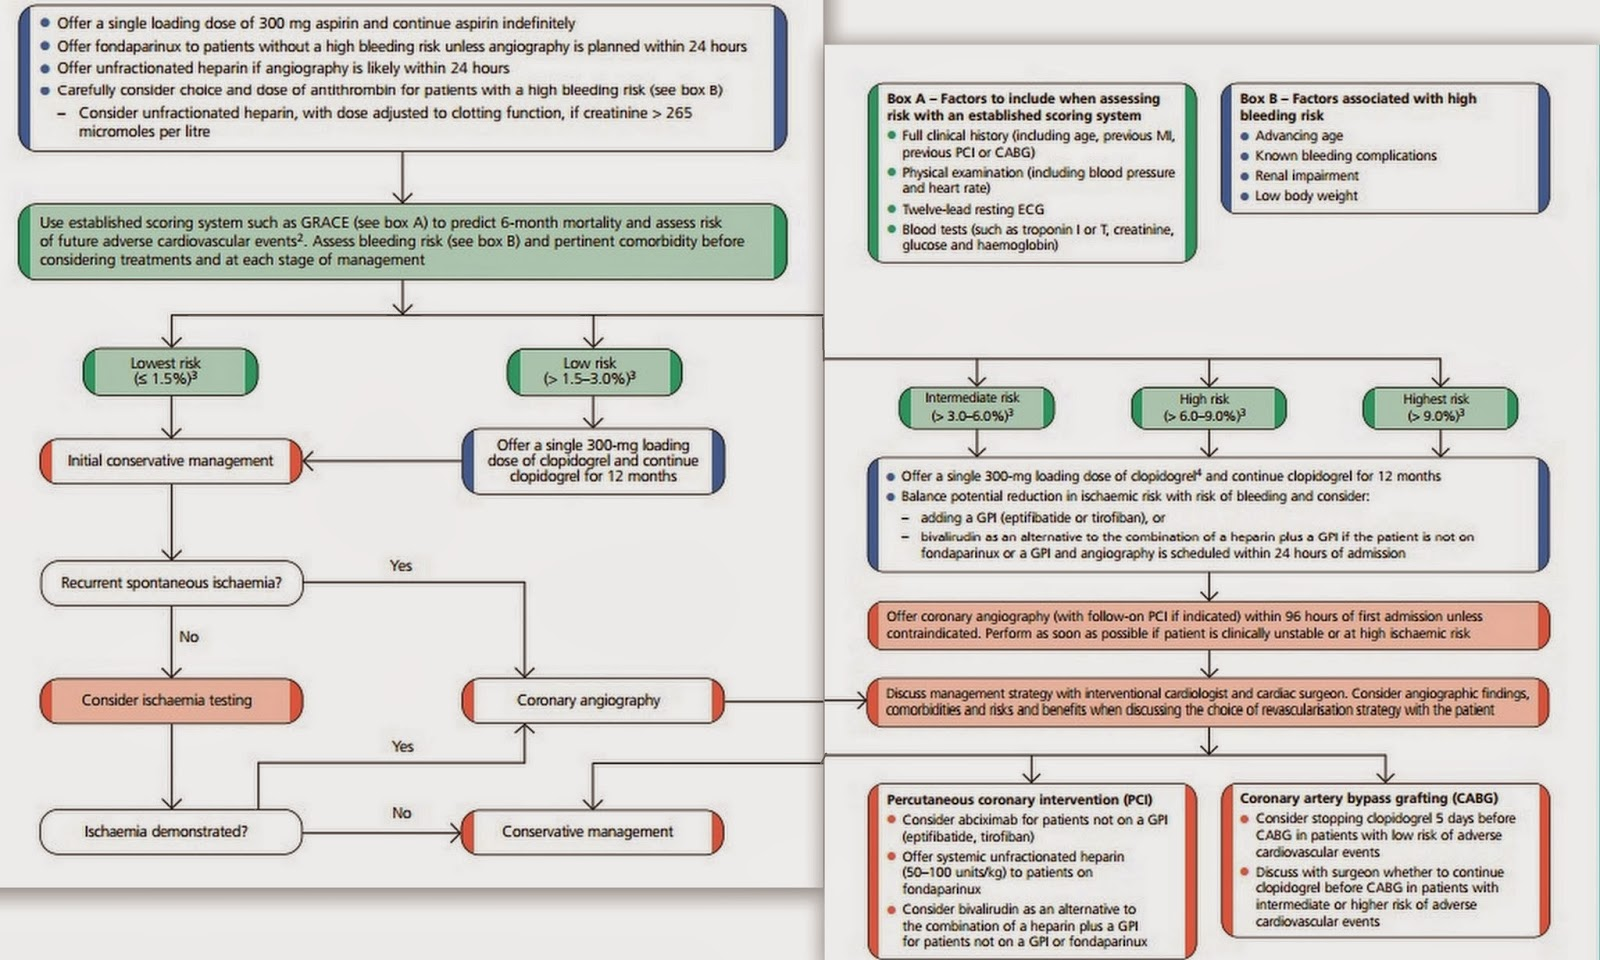 MEDICINE PAKISTAN: Management of Unstable Angina & NSTEMI - An ...